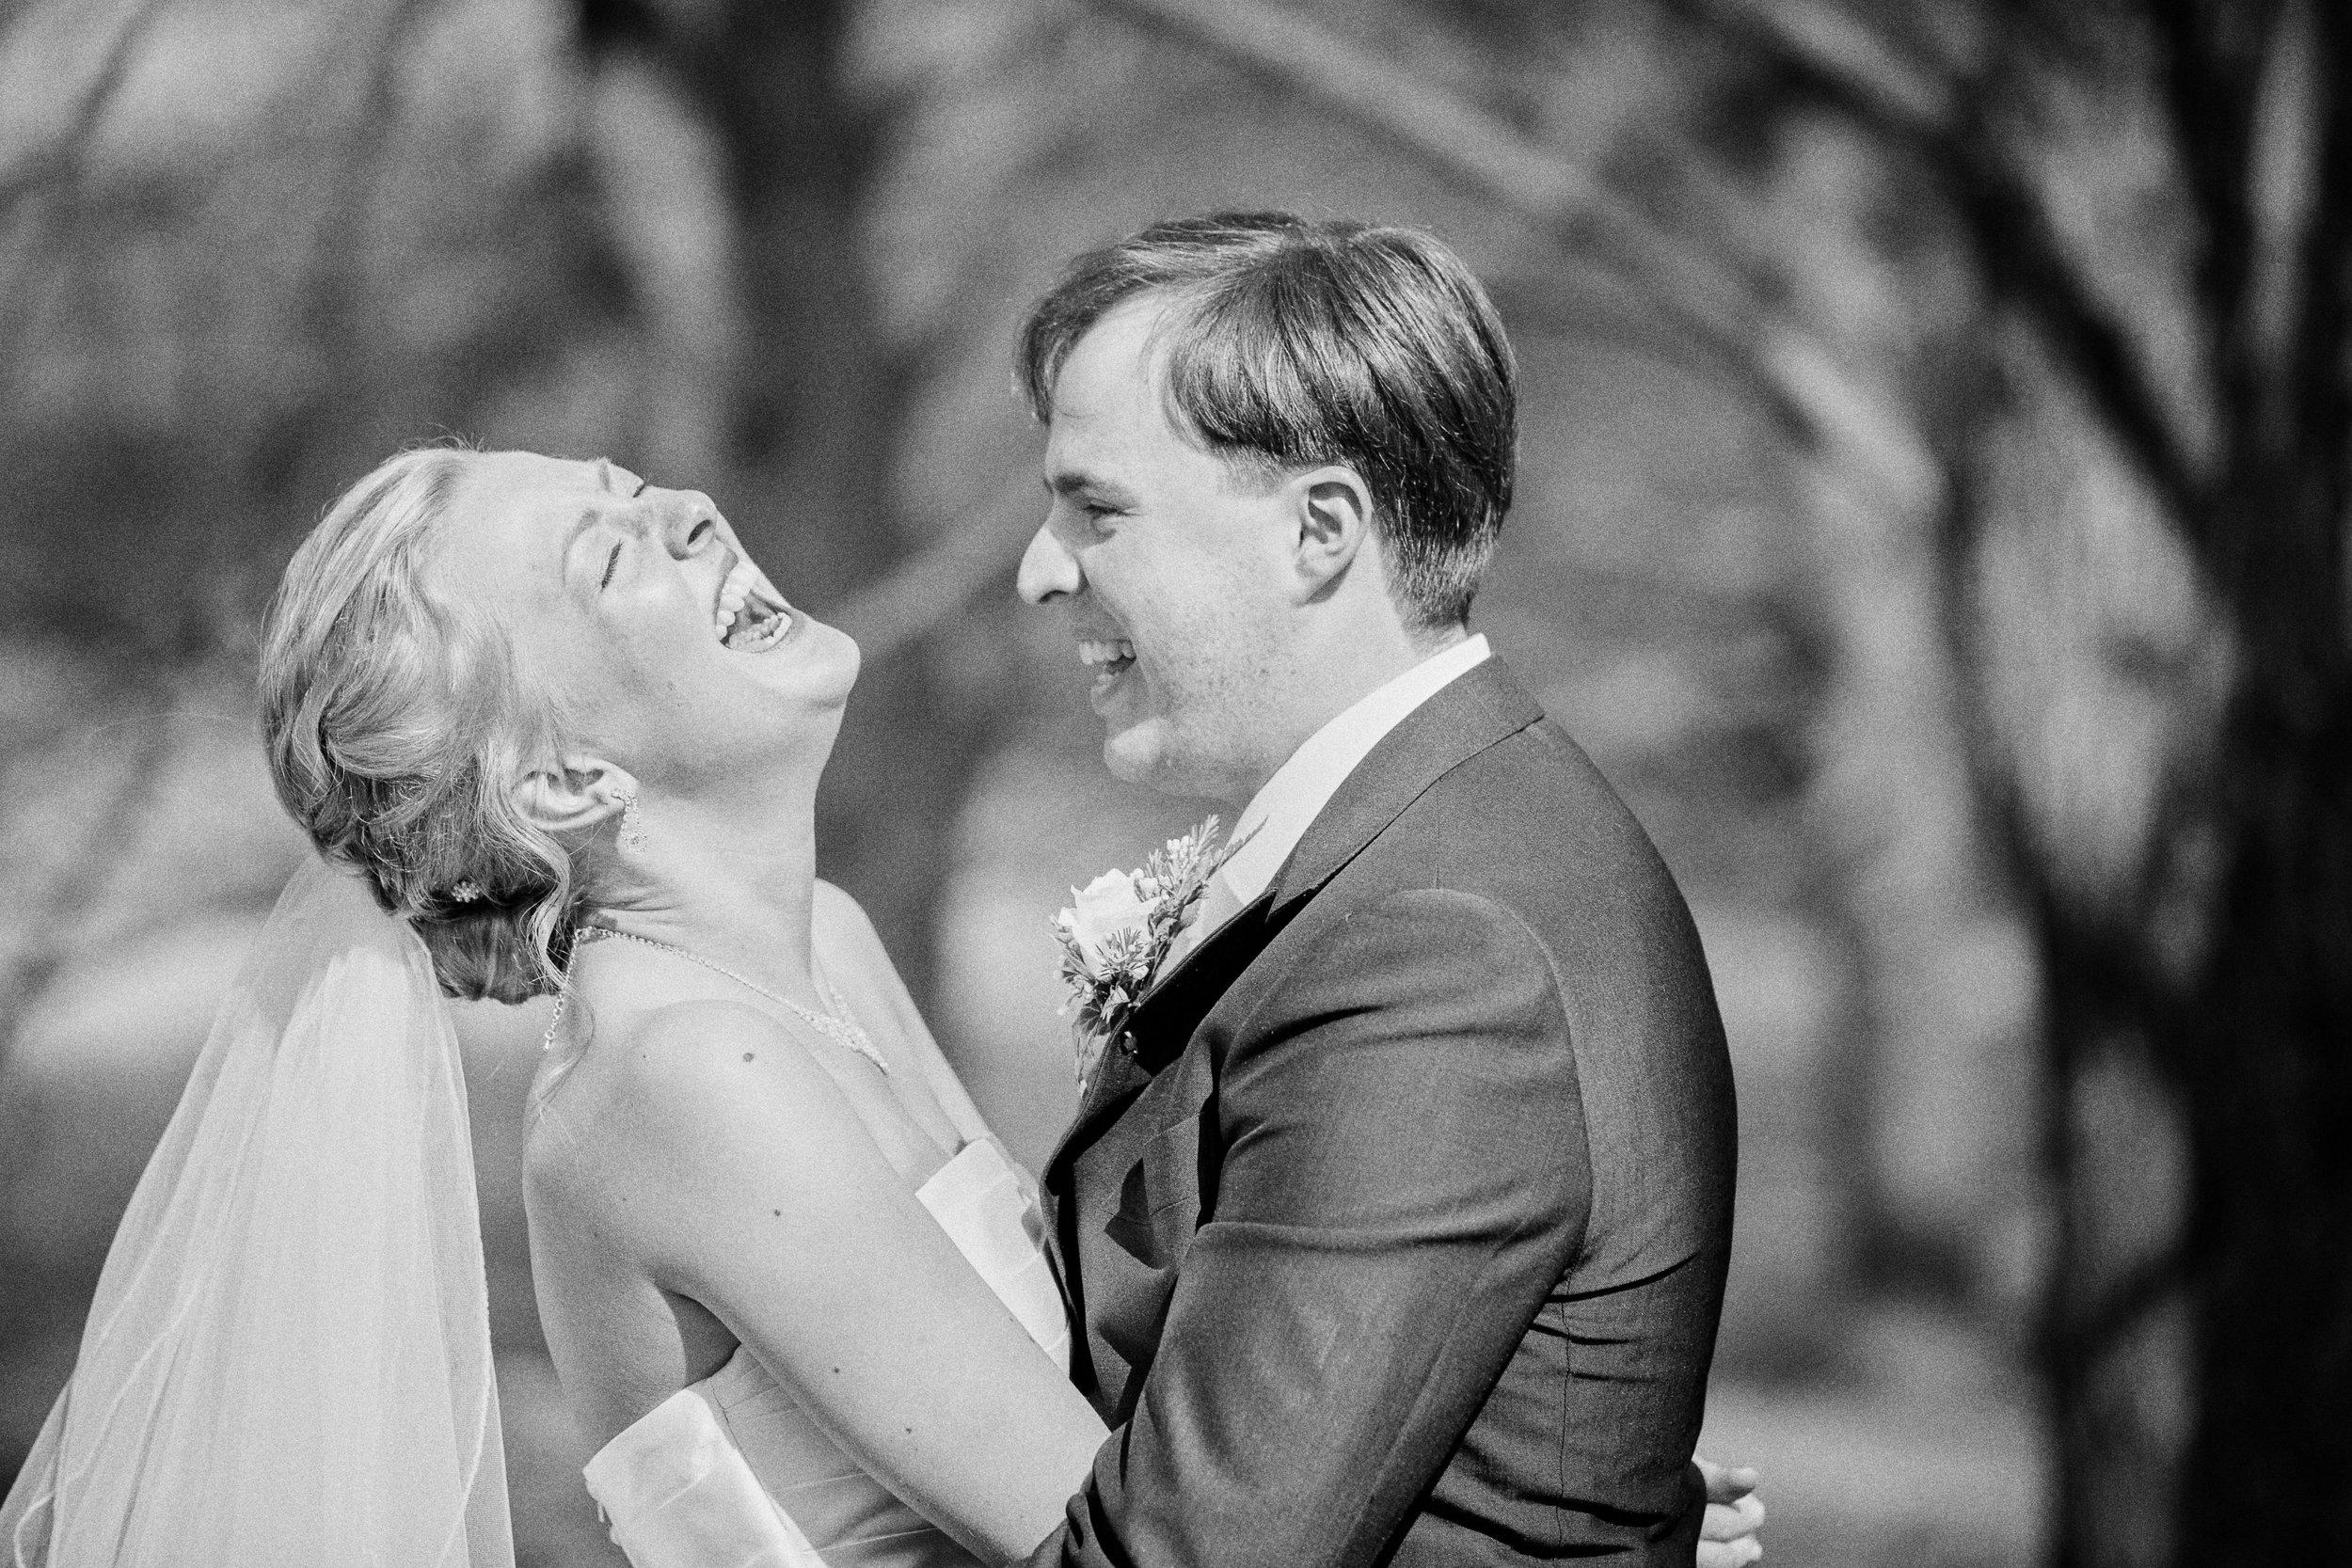 bruidsfotografie-trouwreprotage-huwelijksfotografie-bruidsfotograaf-feestfotografie-Danielle-Benjamin-08.jpg